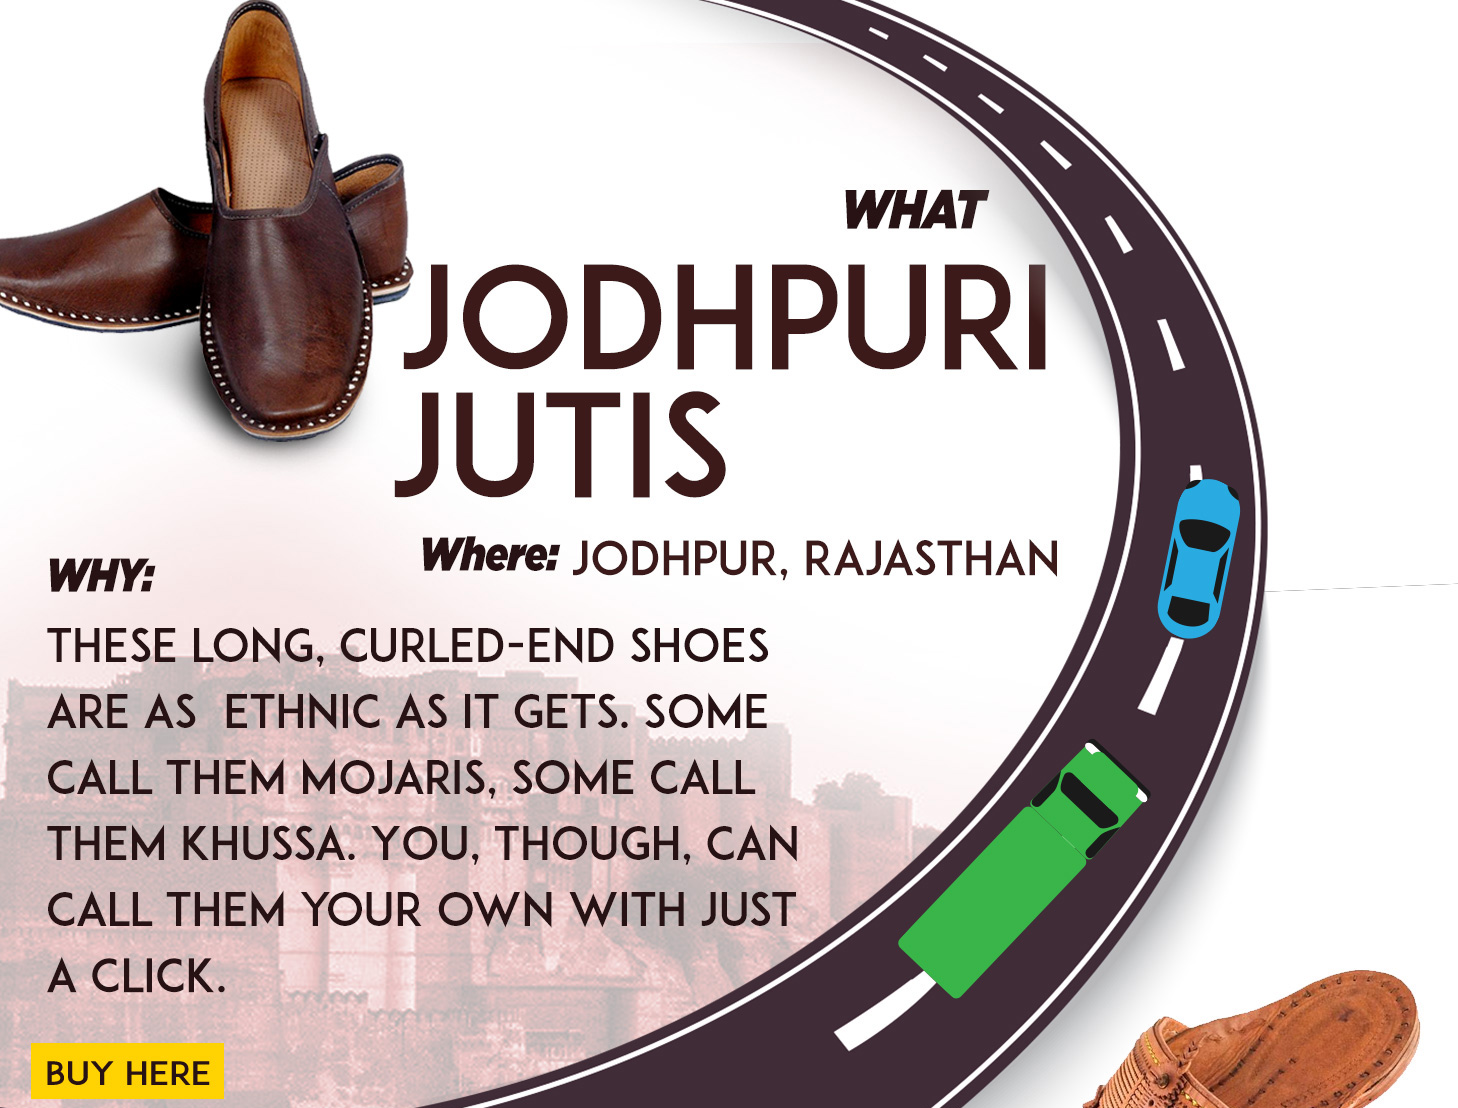 what Jodhpuri jutis